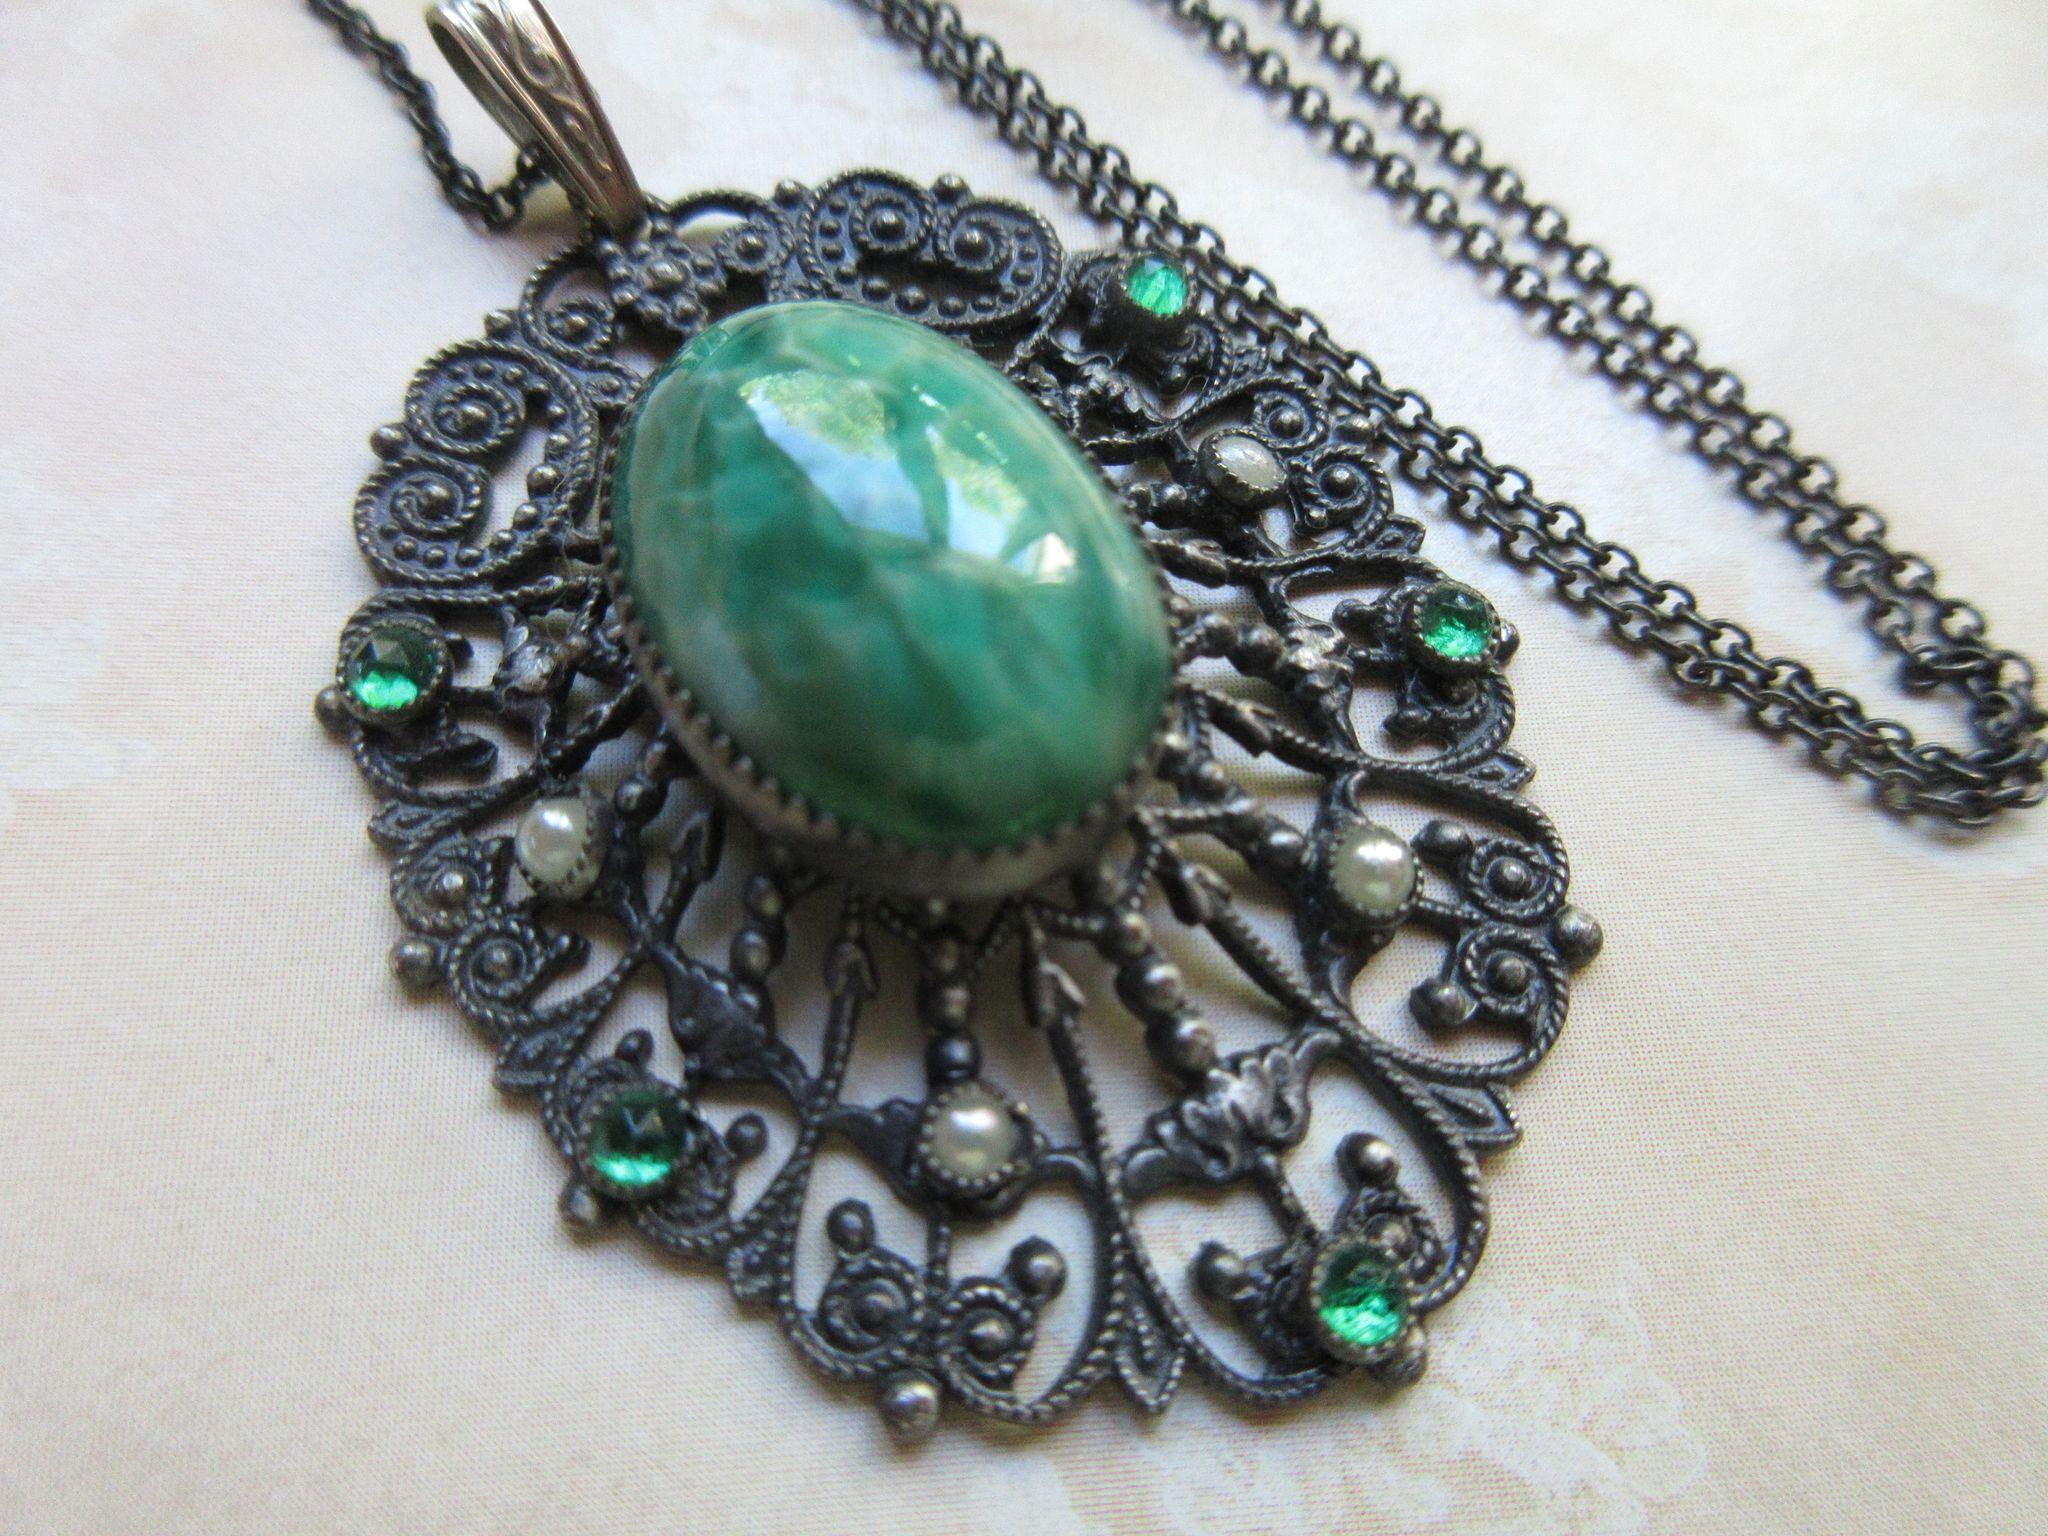 Deco 1930s Filigree Art Glass Vintage Necklace